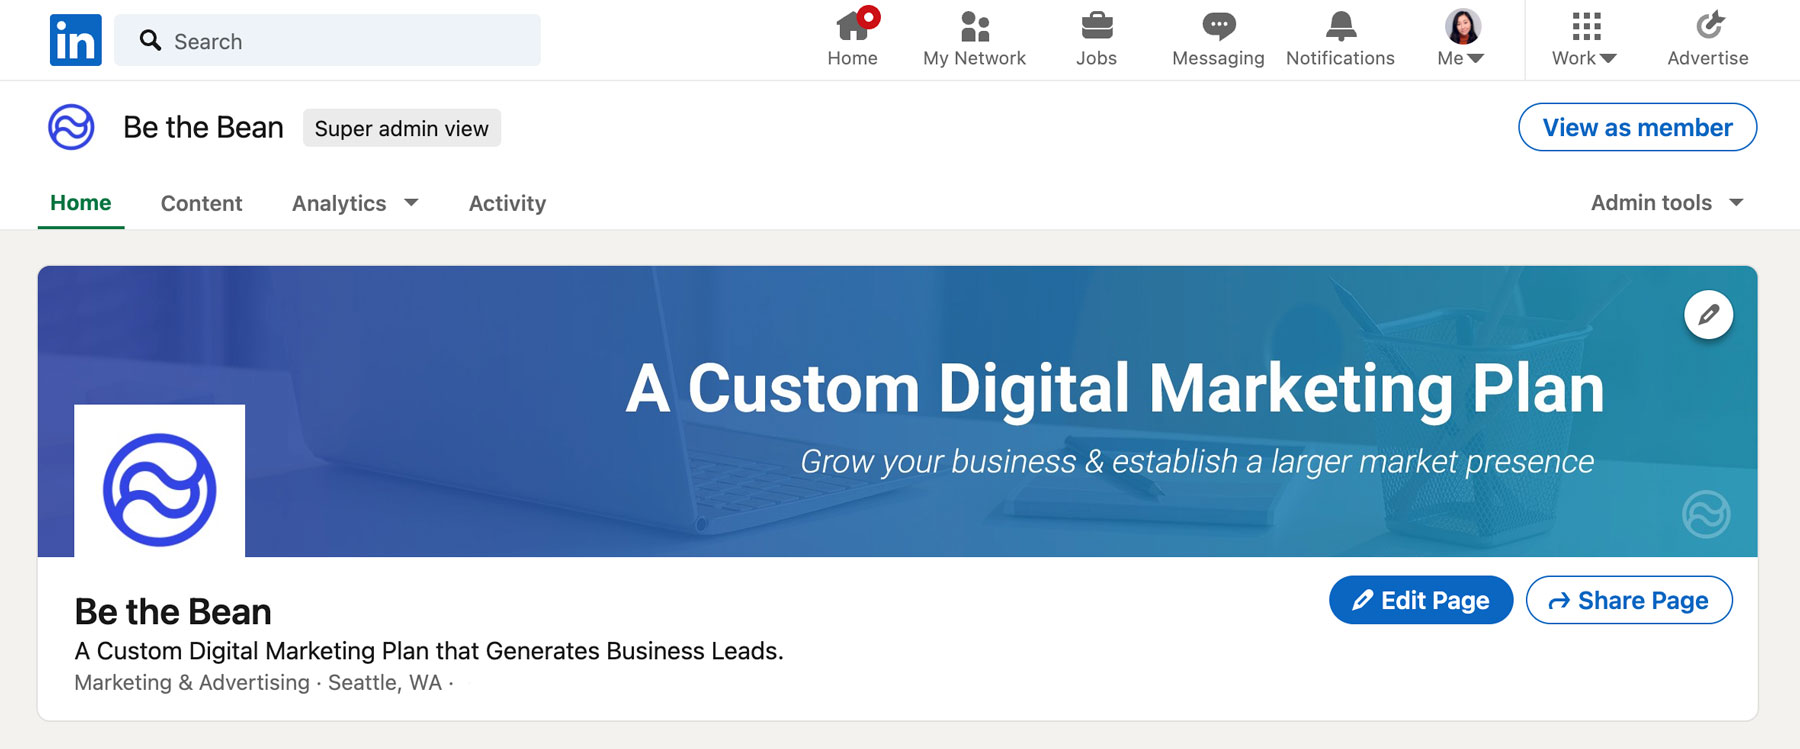 be the bean LinkedIn company page